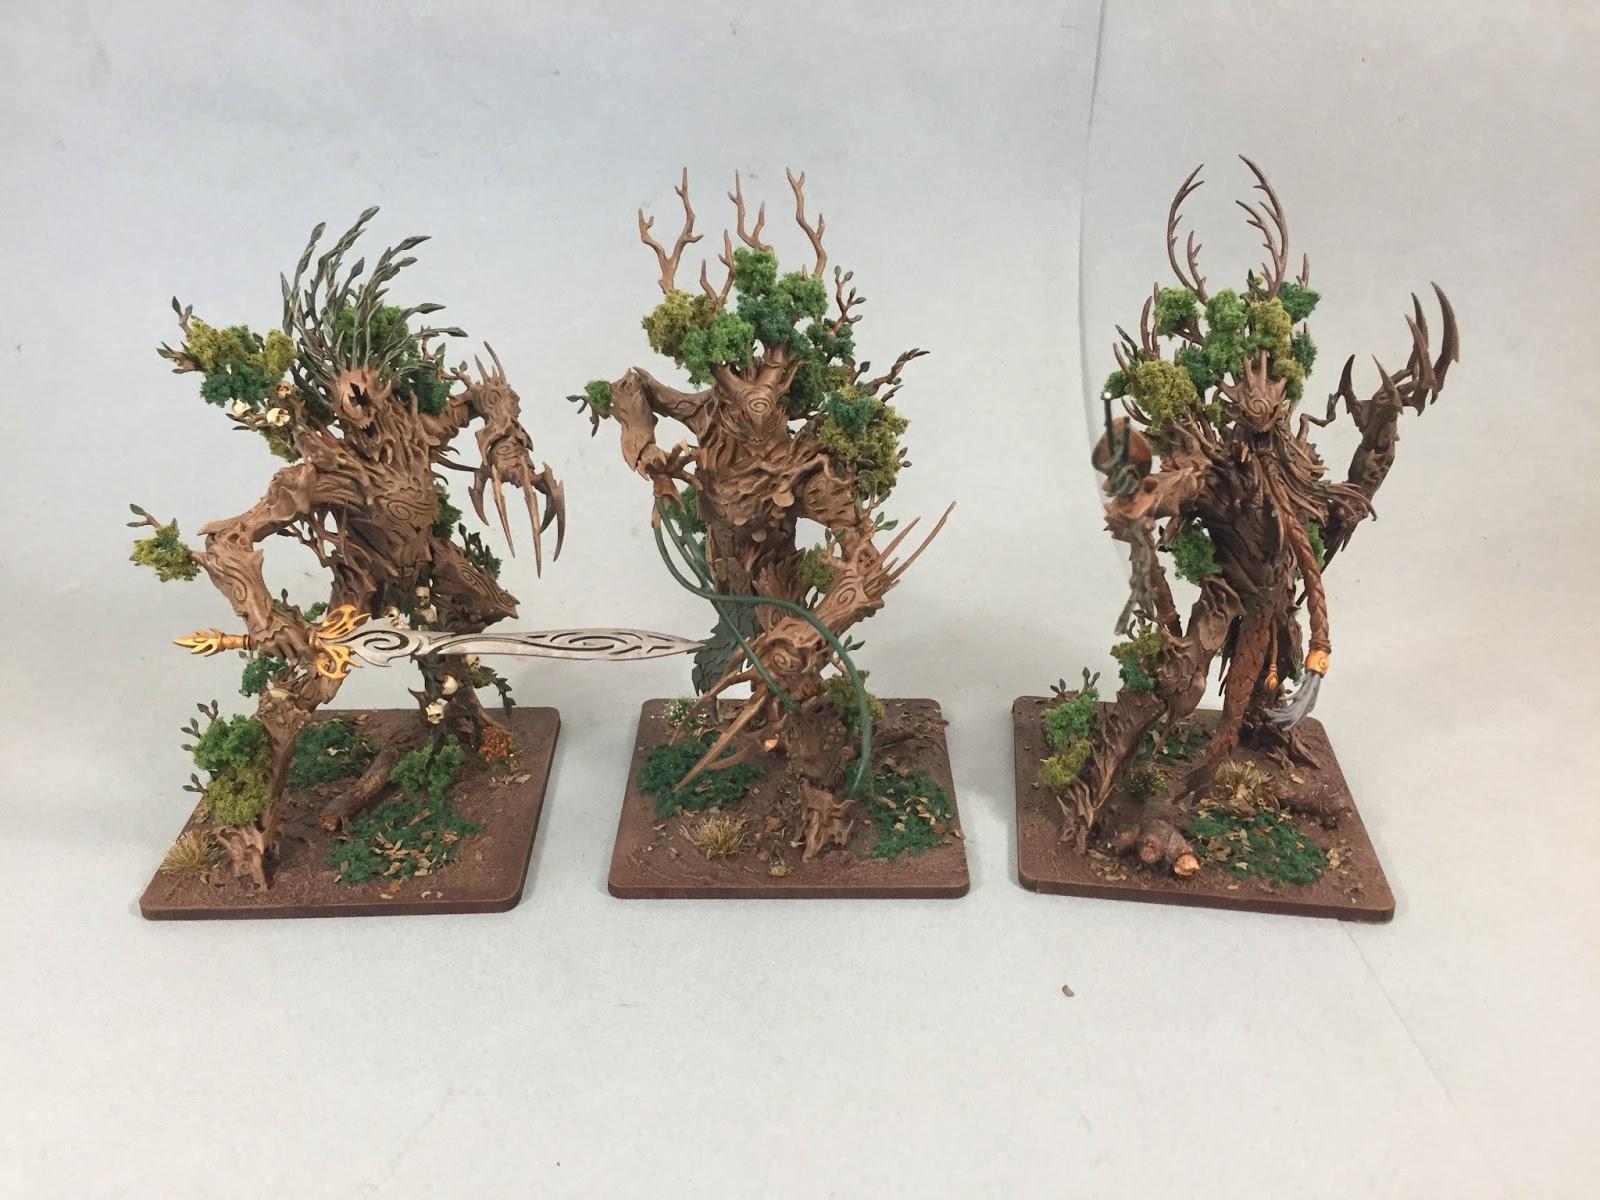 Itty Bitty Soldiers Kings Of War Tree Herders